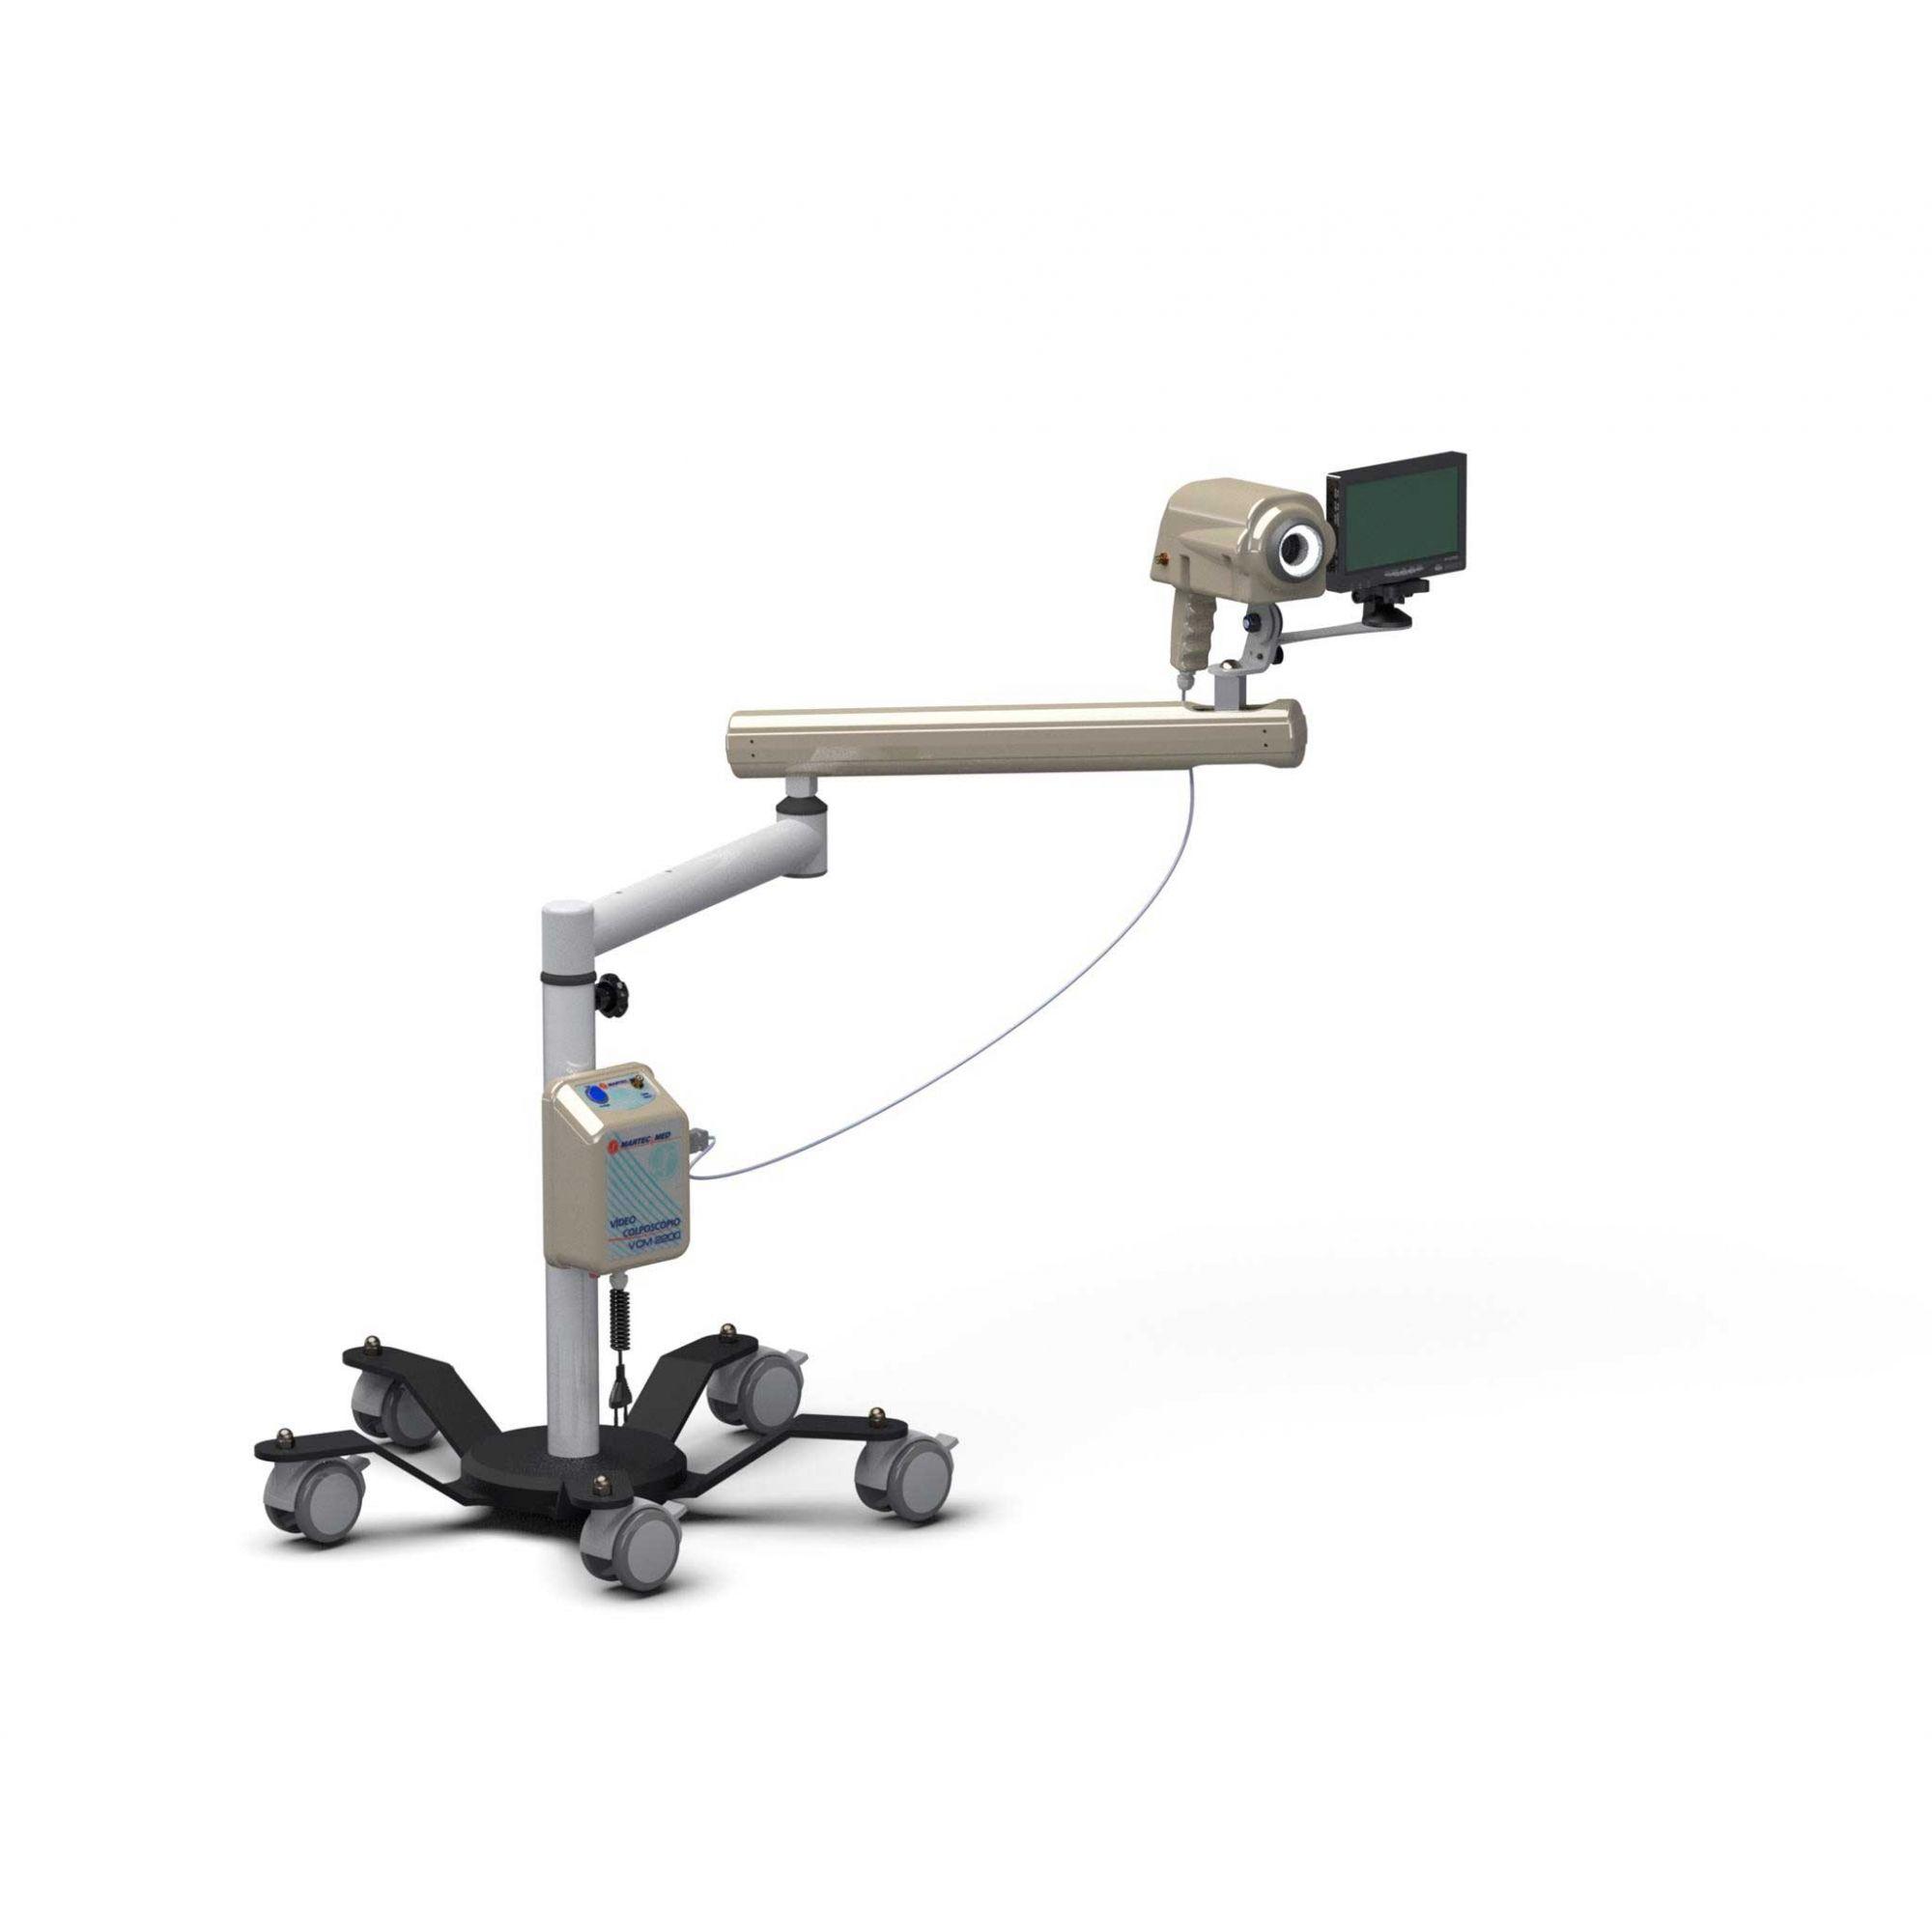 Videocolposcopio (acompanha monitor 7') c/Braço – Modelo VCM2200 B – Martec